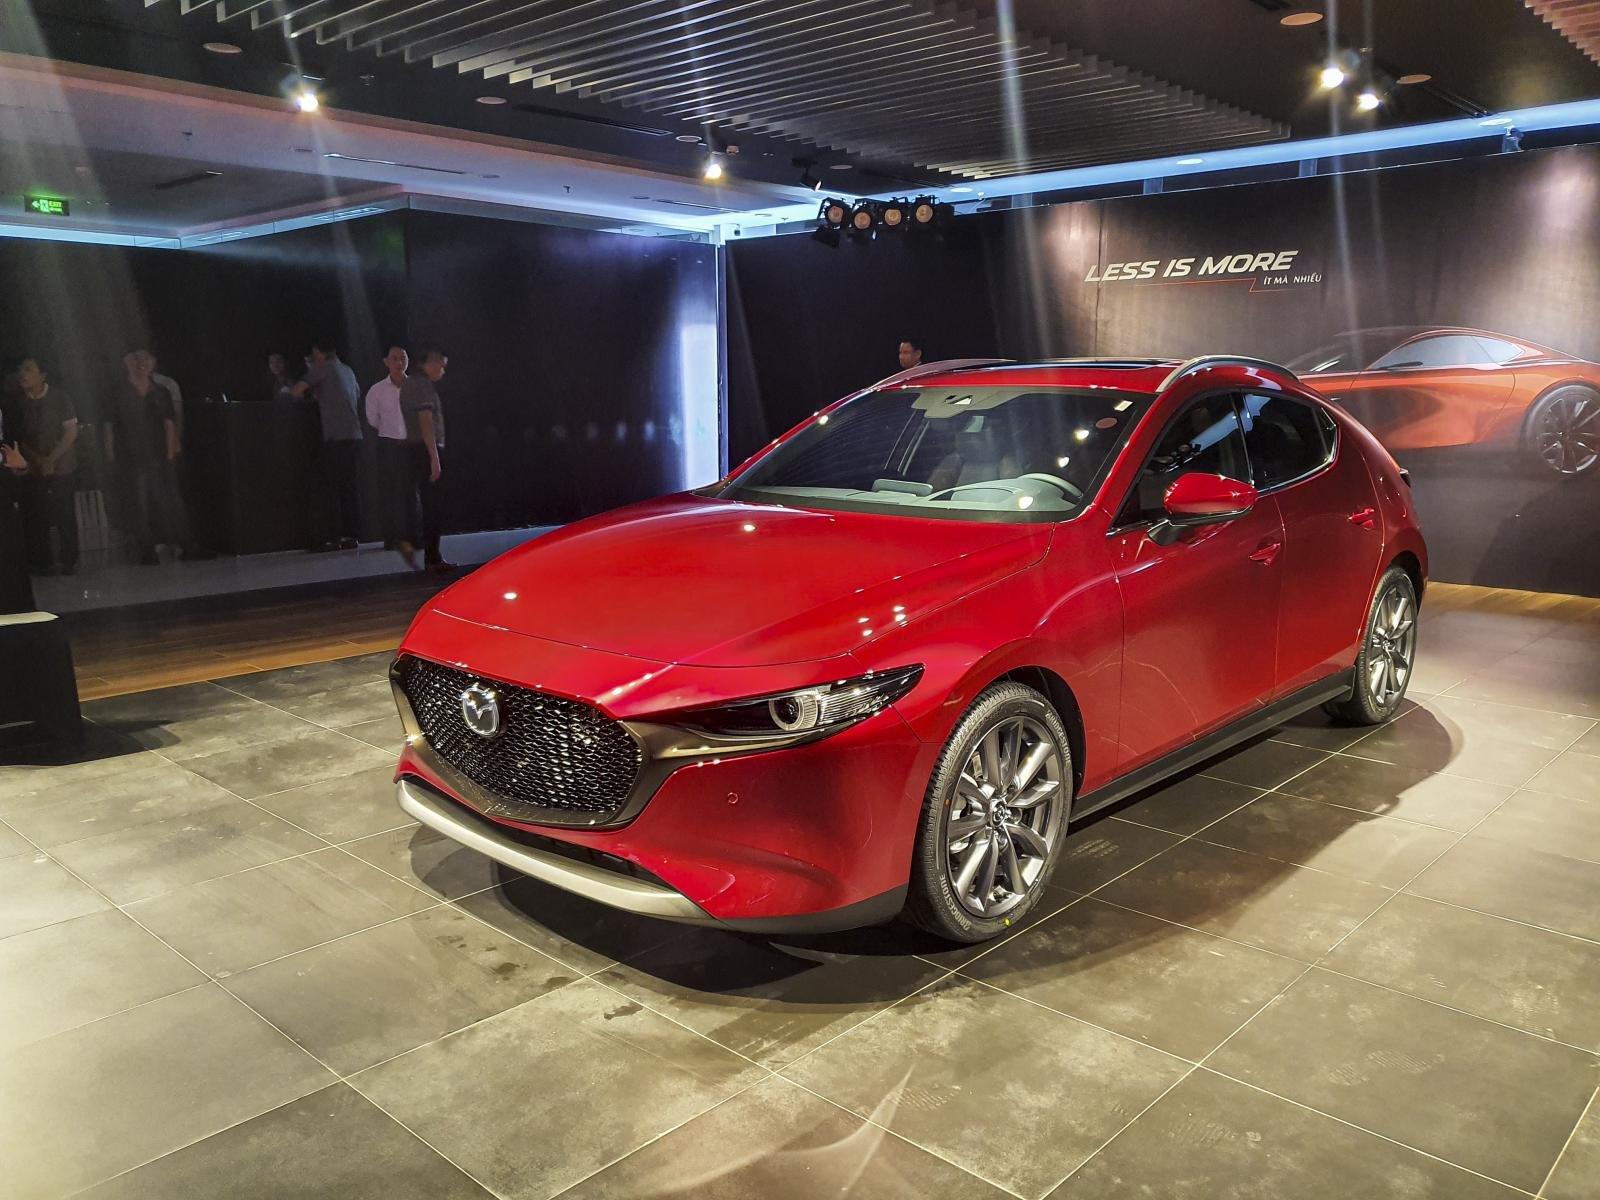 Đánh giá xe Mazda 3 Sport 2020 2.0L Premium.